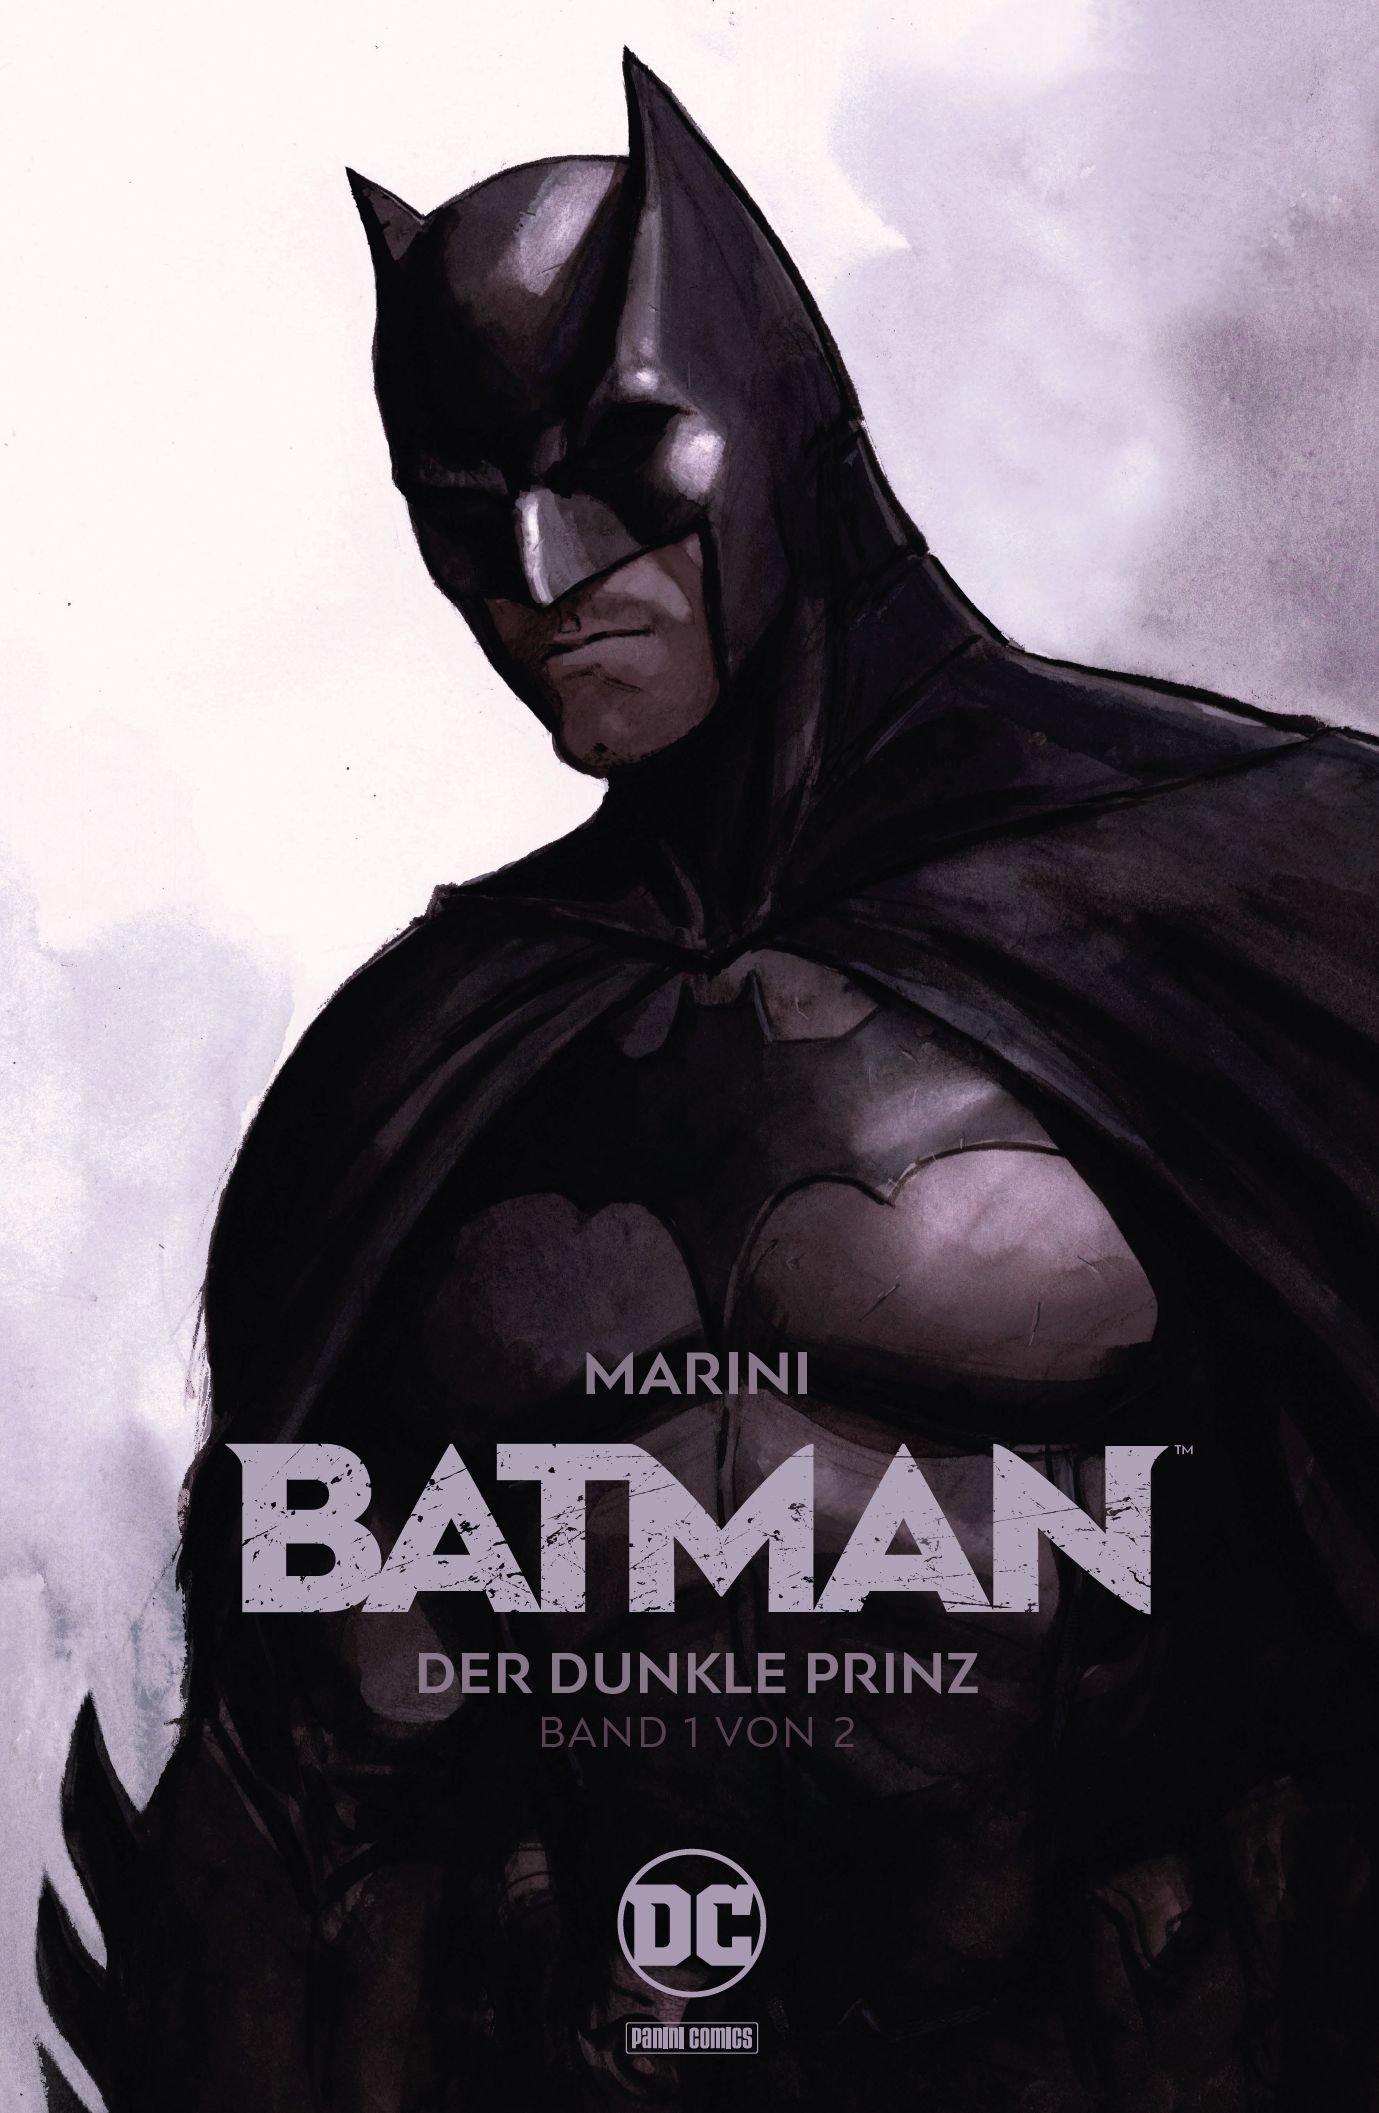 Batman: Der Dunkle Prinz: Bd. 1 (von 2) Gebundenes Buch – 29. Januar 2018 Enrico Marini Monja Reichert Panini 3741607339